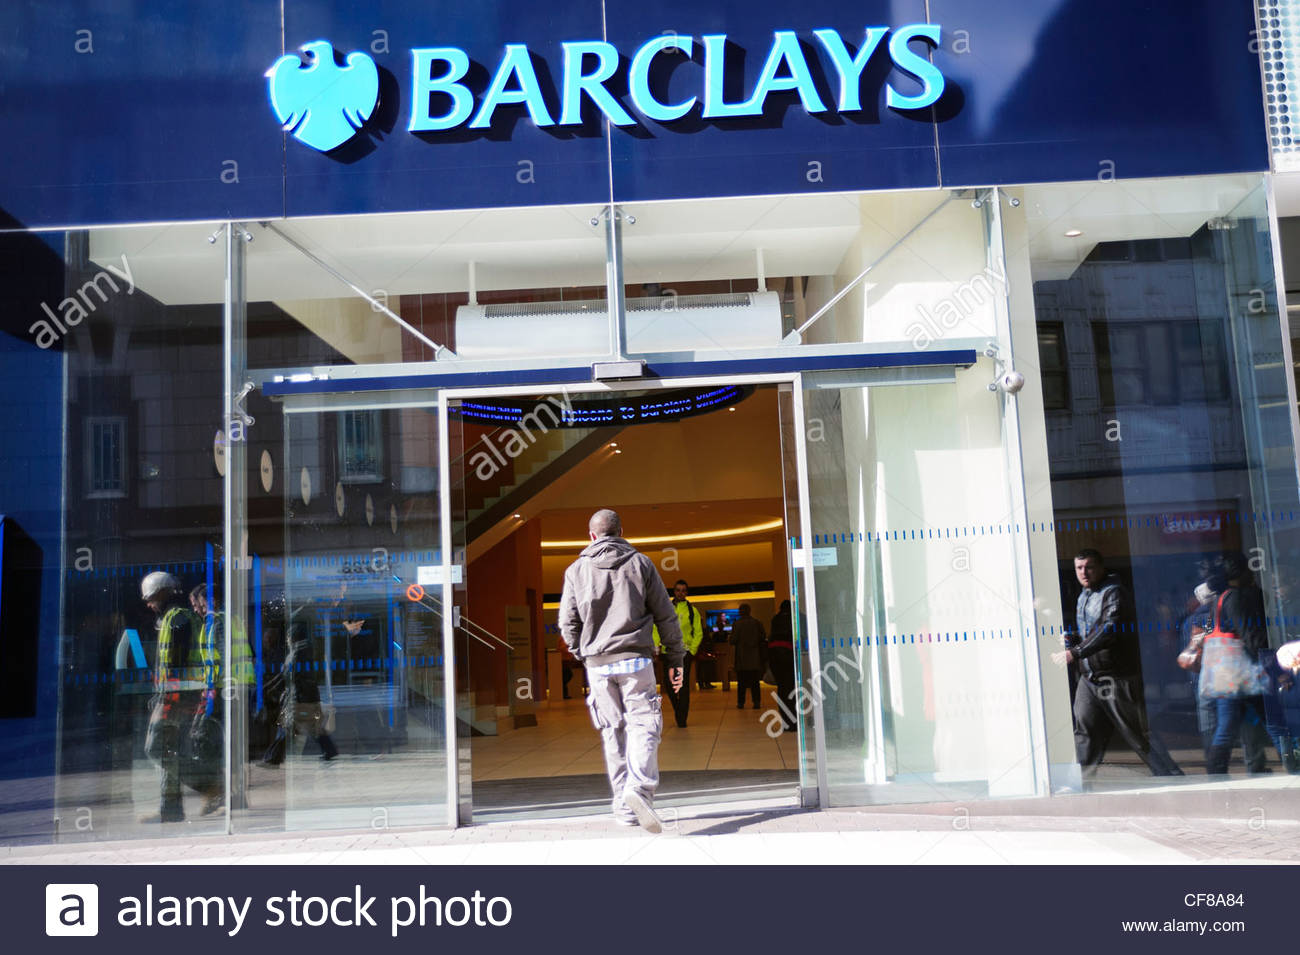 Barclays bank Birmingham, UK. - Stock Image